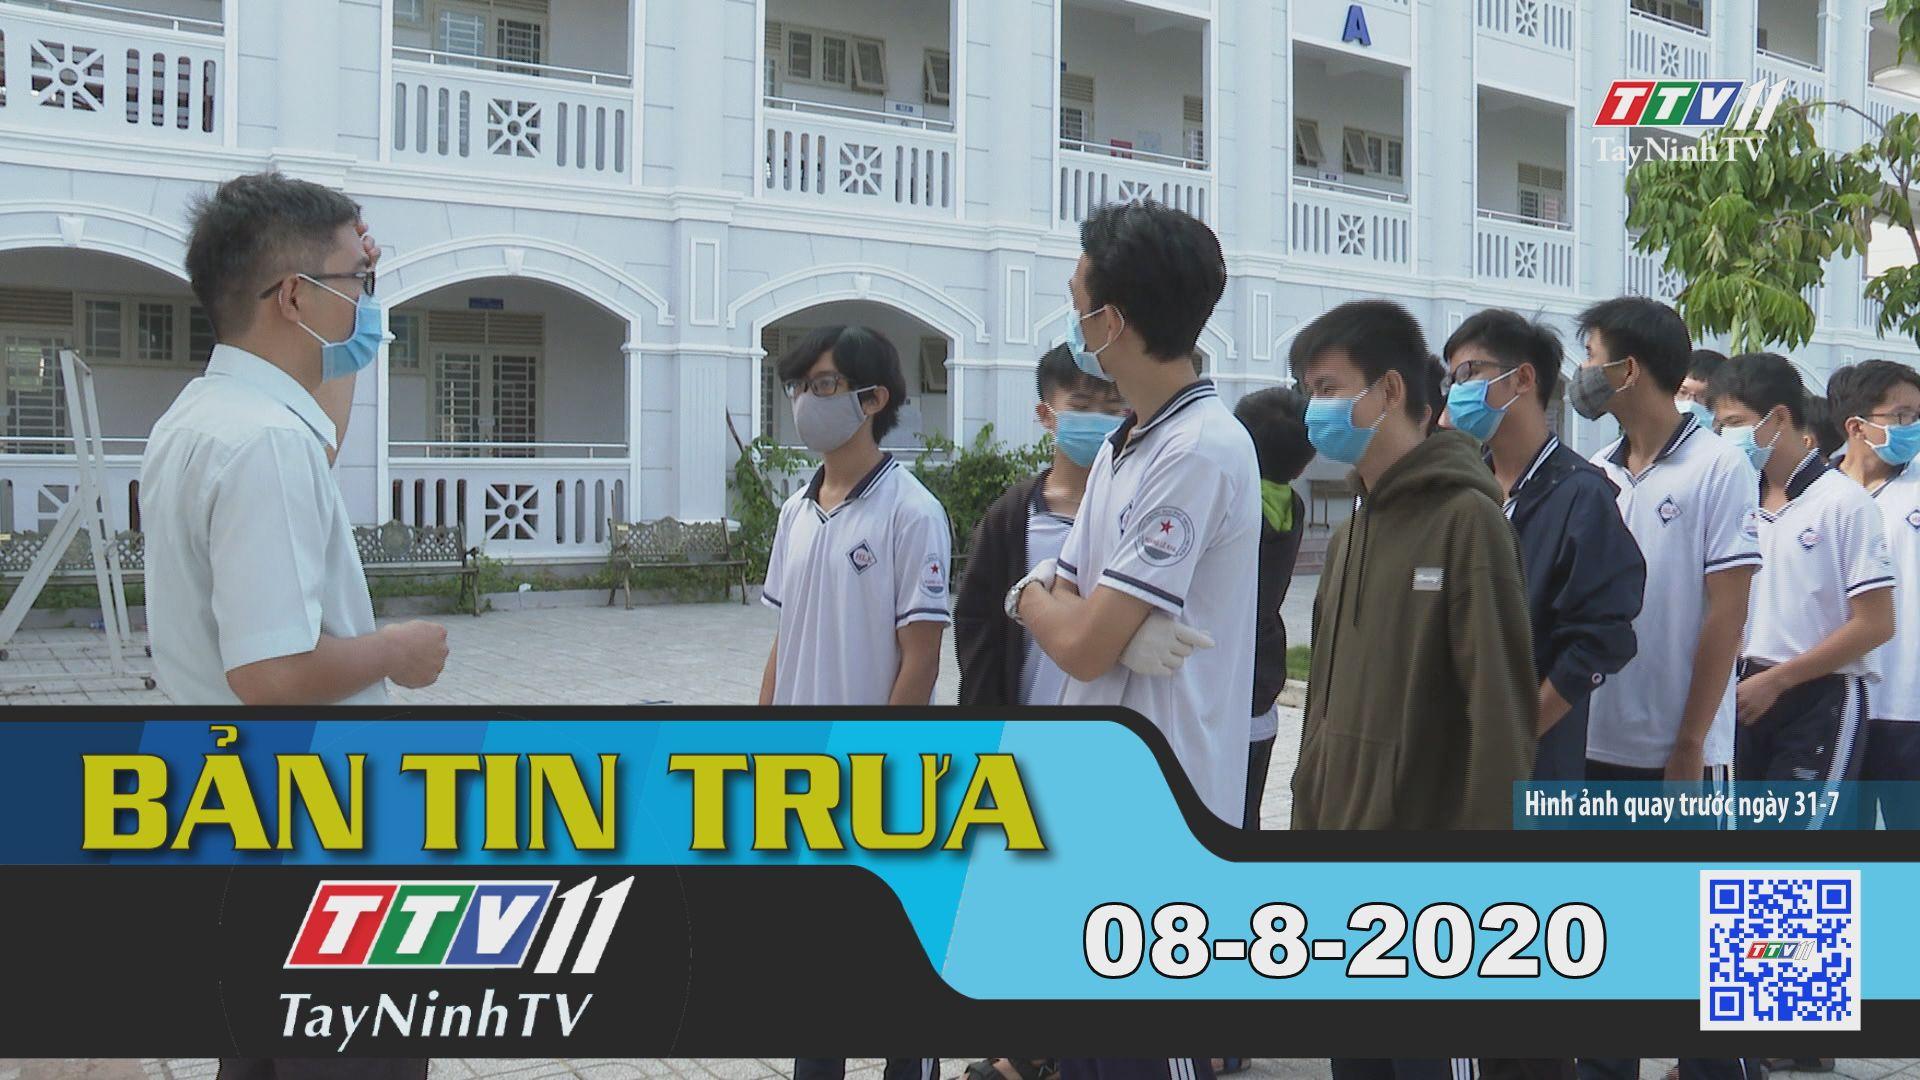 Bản tin trưa 08-8-2020 | Tin tức hôm nay | TayNinhTV